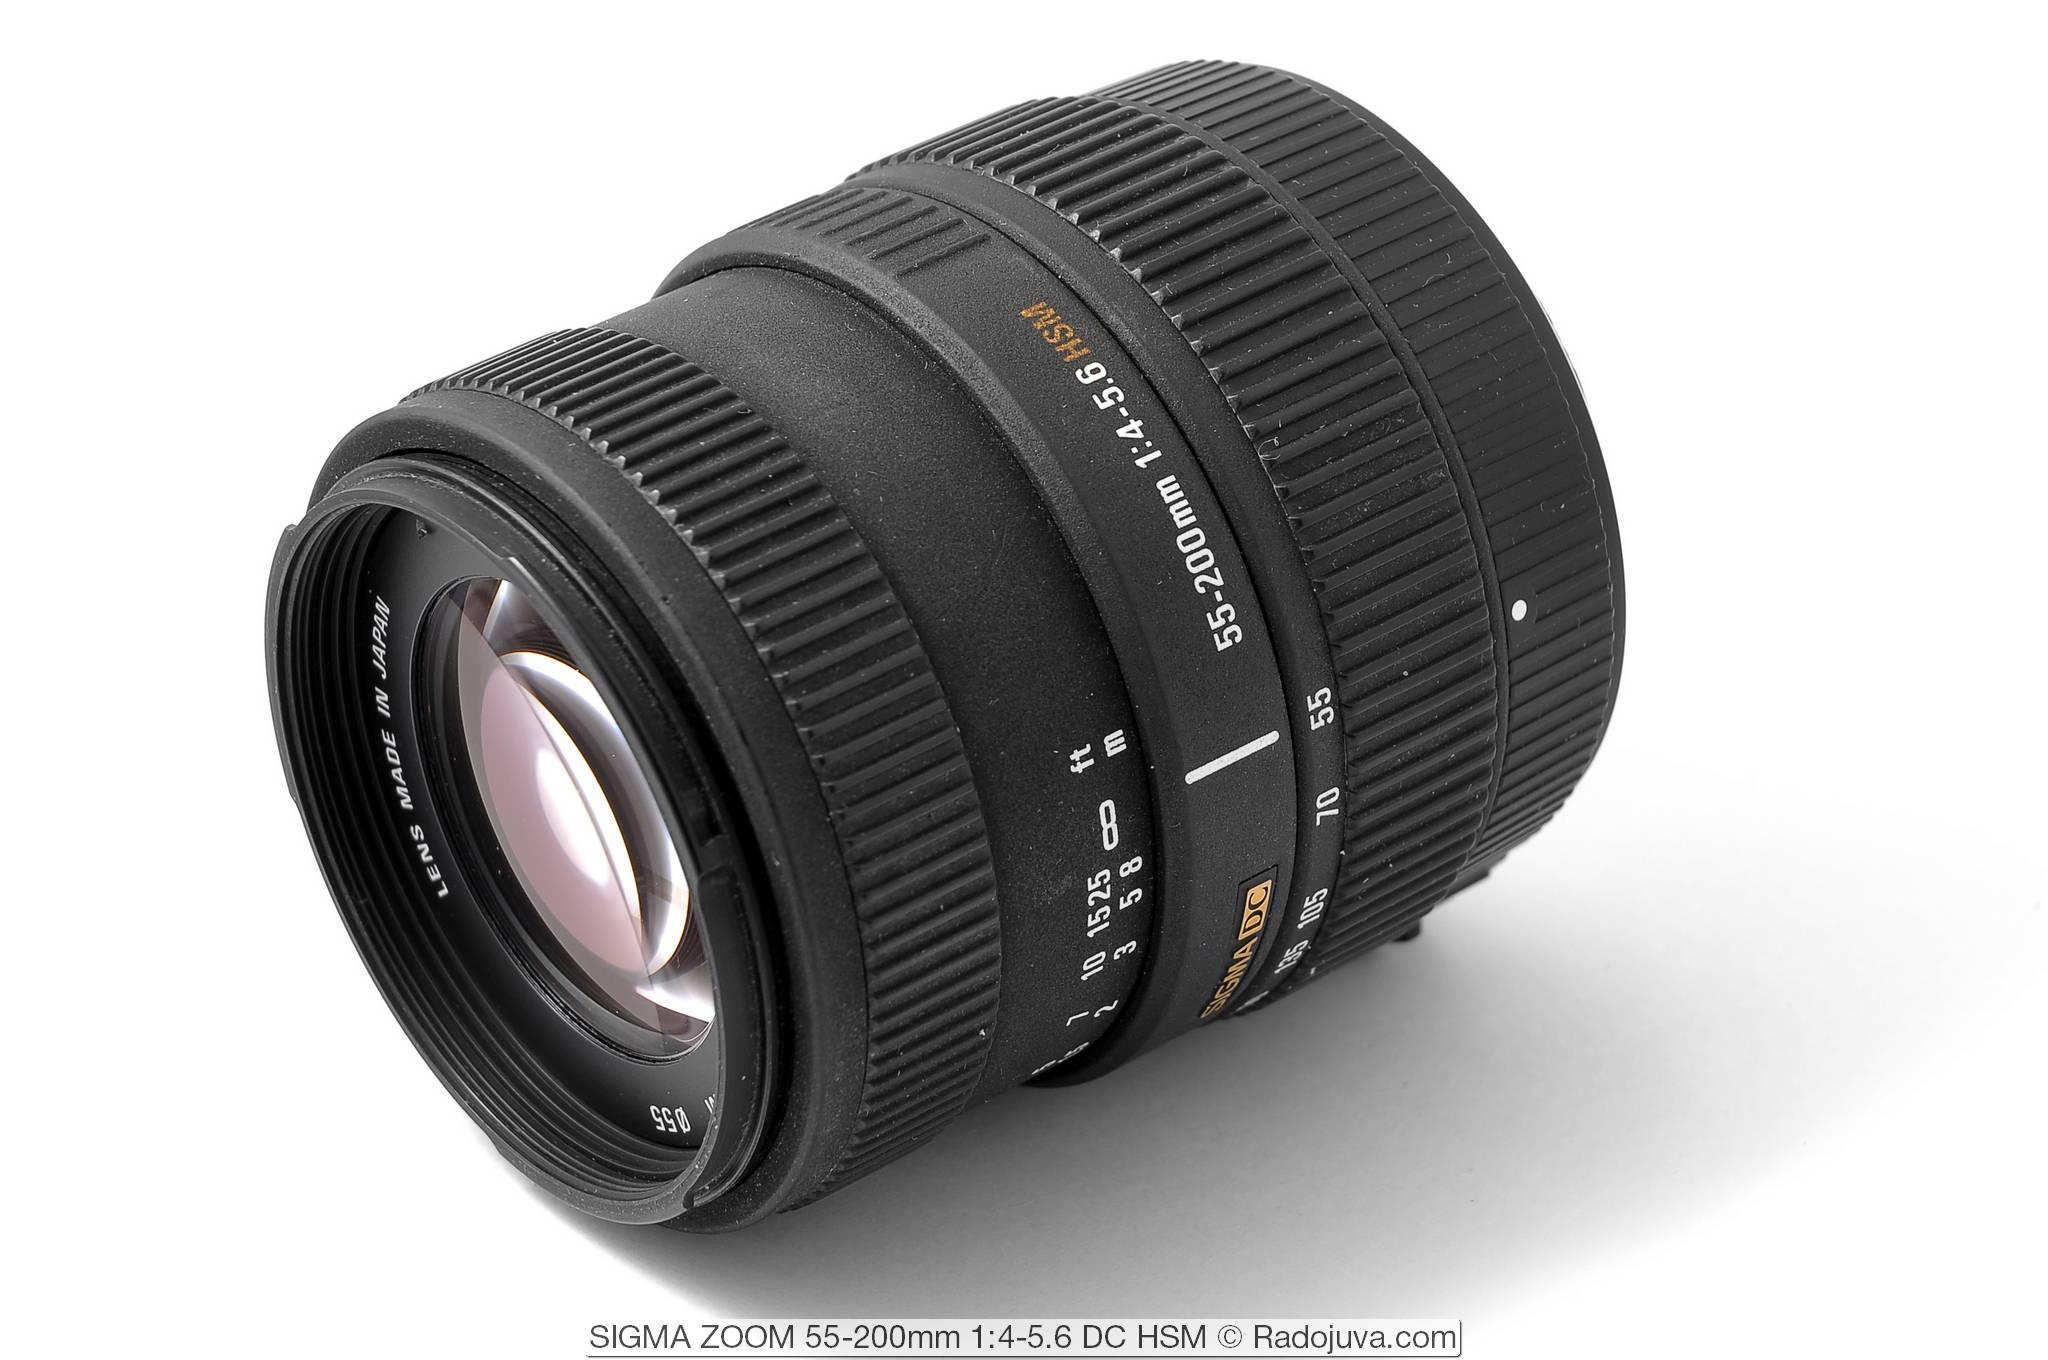 SIGMA ZOOM 55-200mm 1:4-5.6 DC HSM